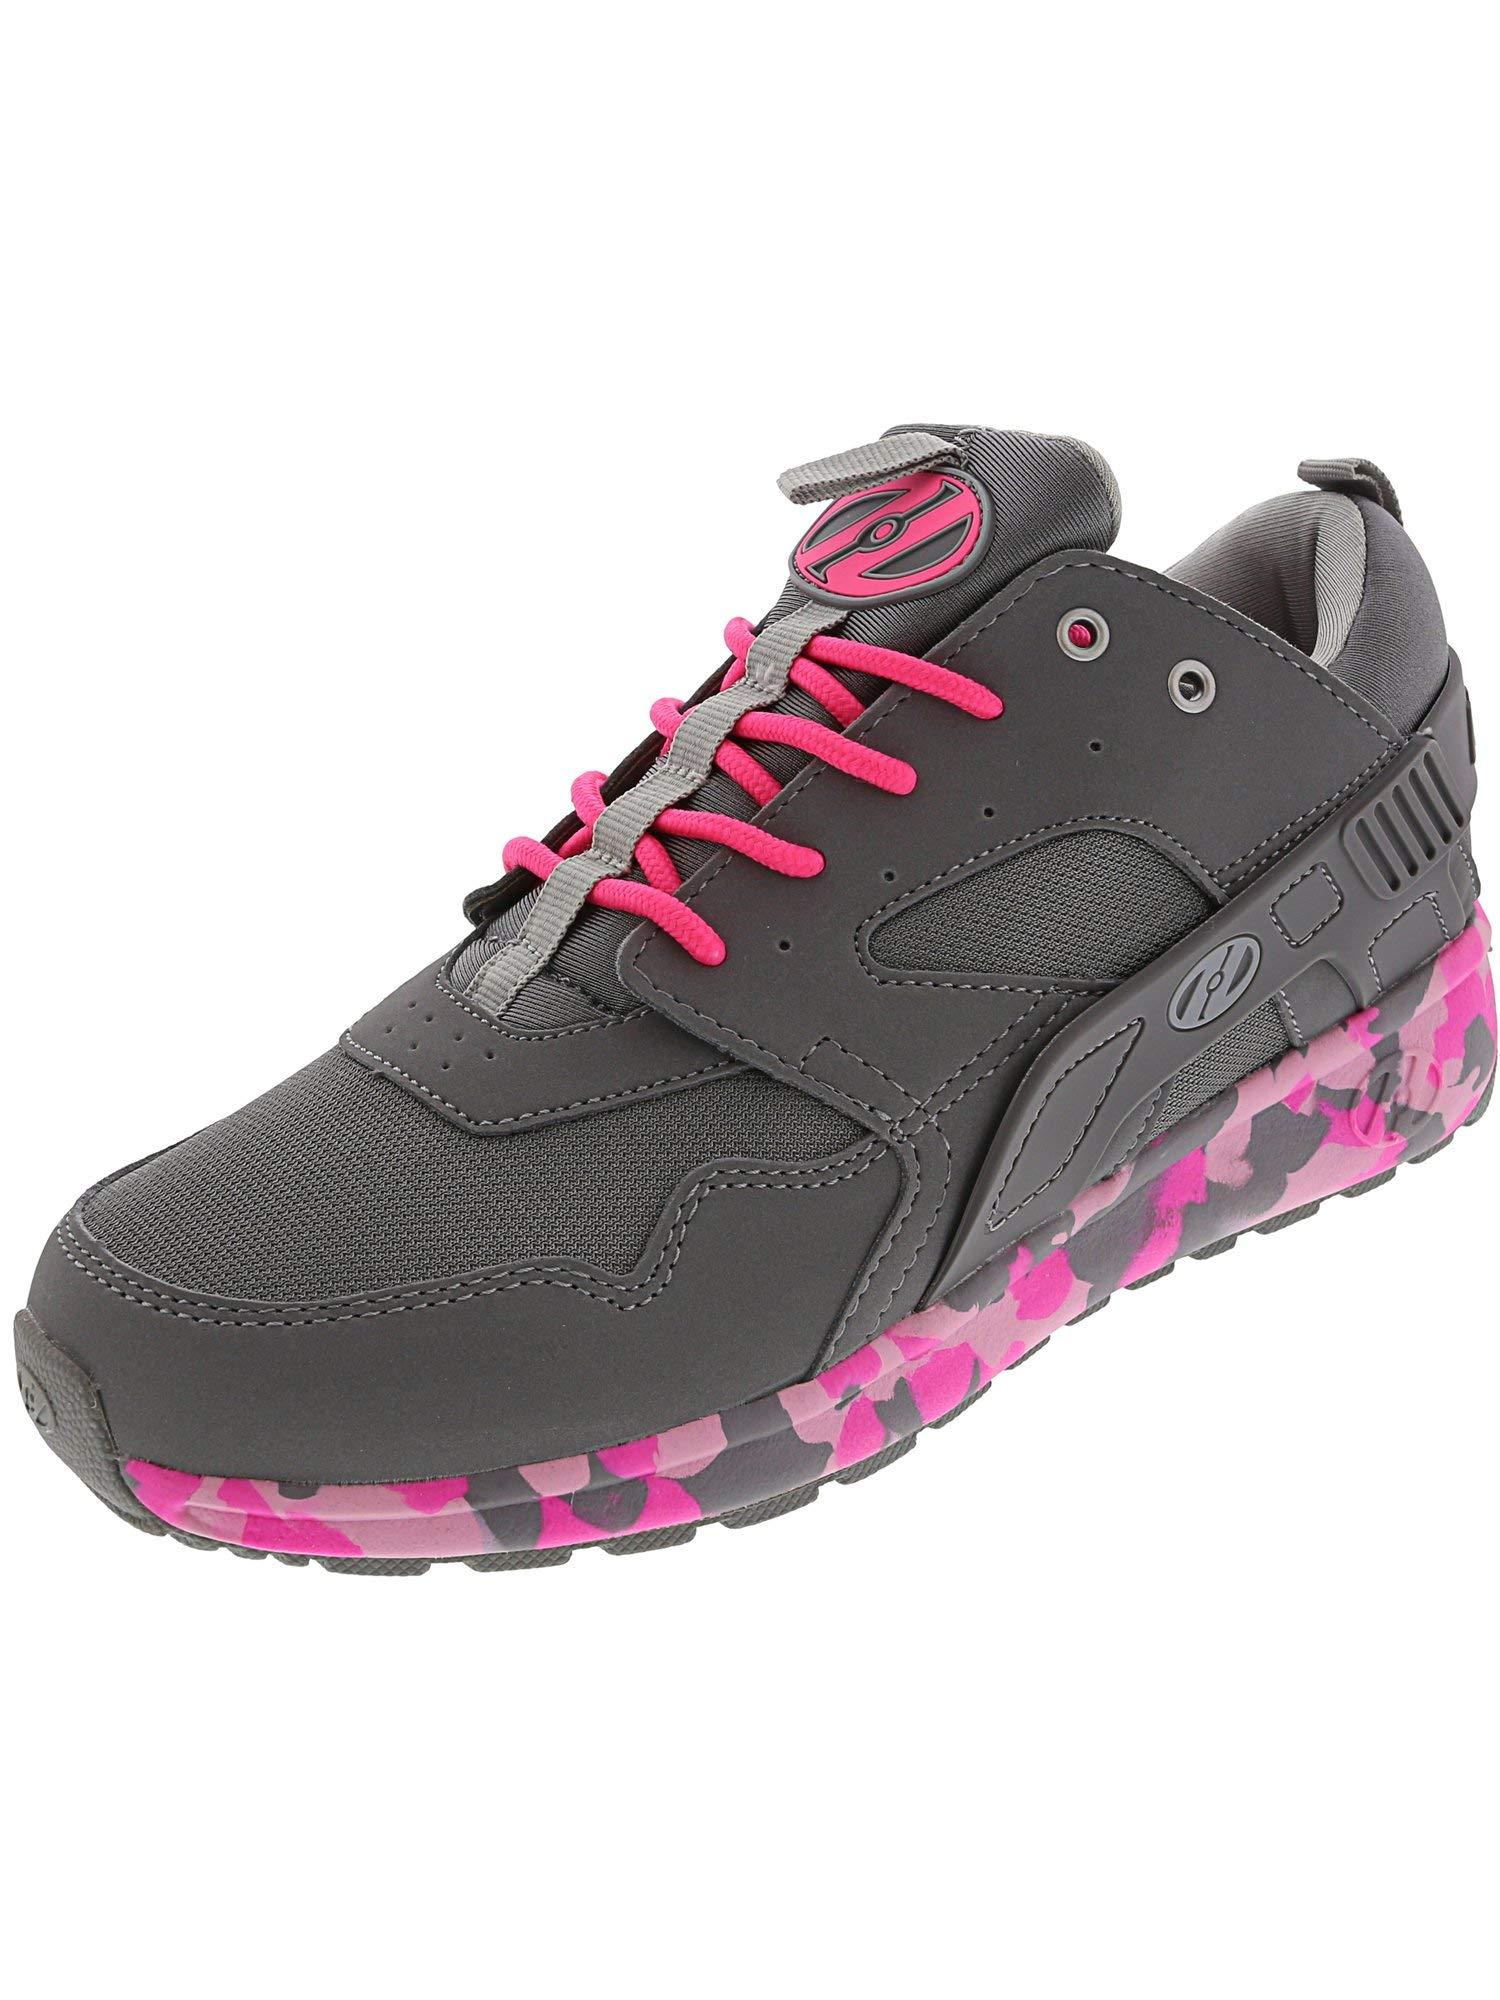 Heelys HE100098H Kid's Force Sneakers, Grey/Pink Confetti - 1 by Heelys (Image #1)